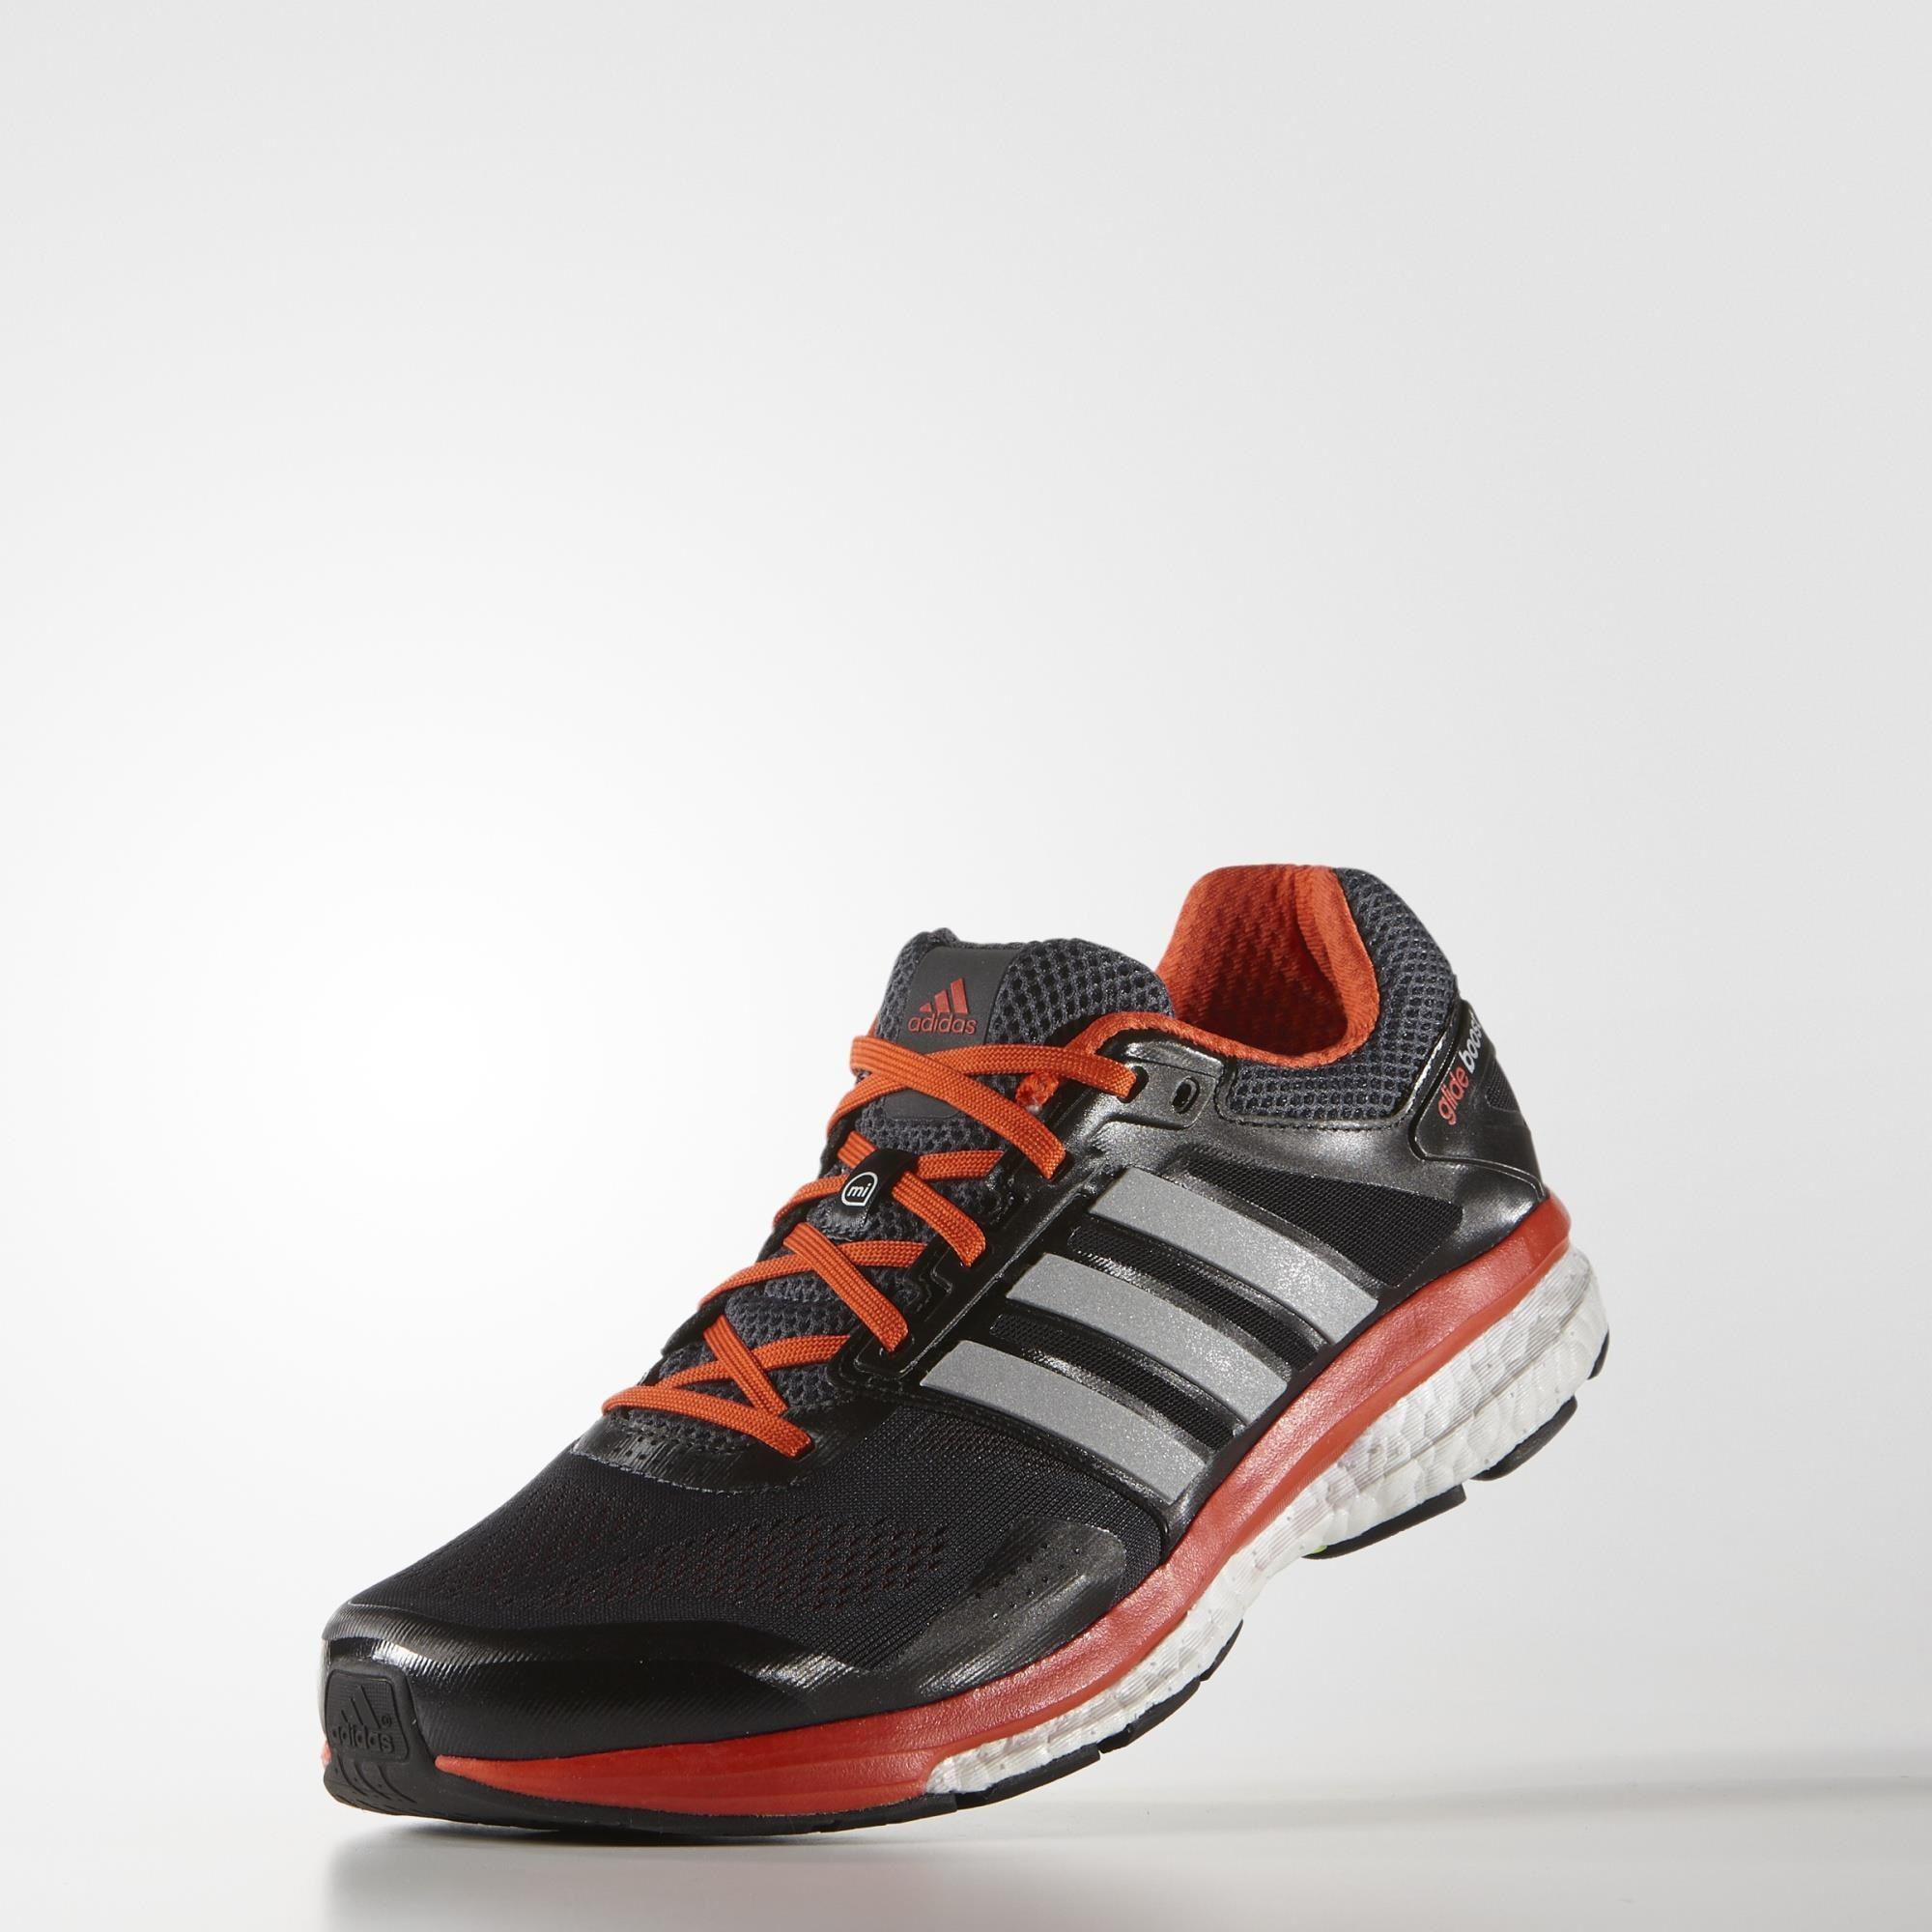 Adidas Mens Supernova Glide Boost 7 Running Shoes - Grey ...